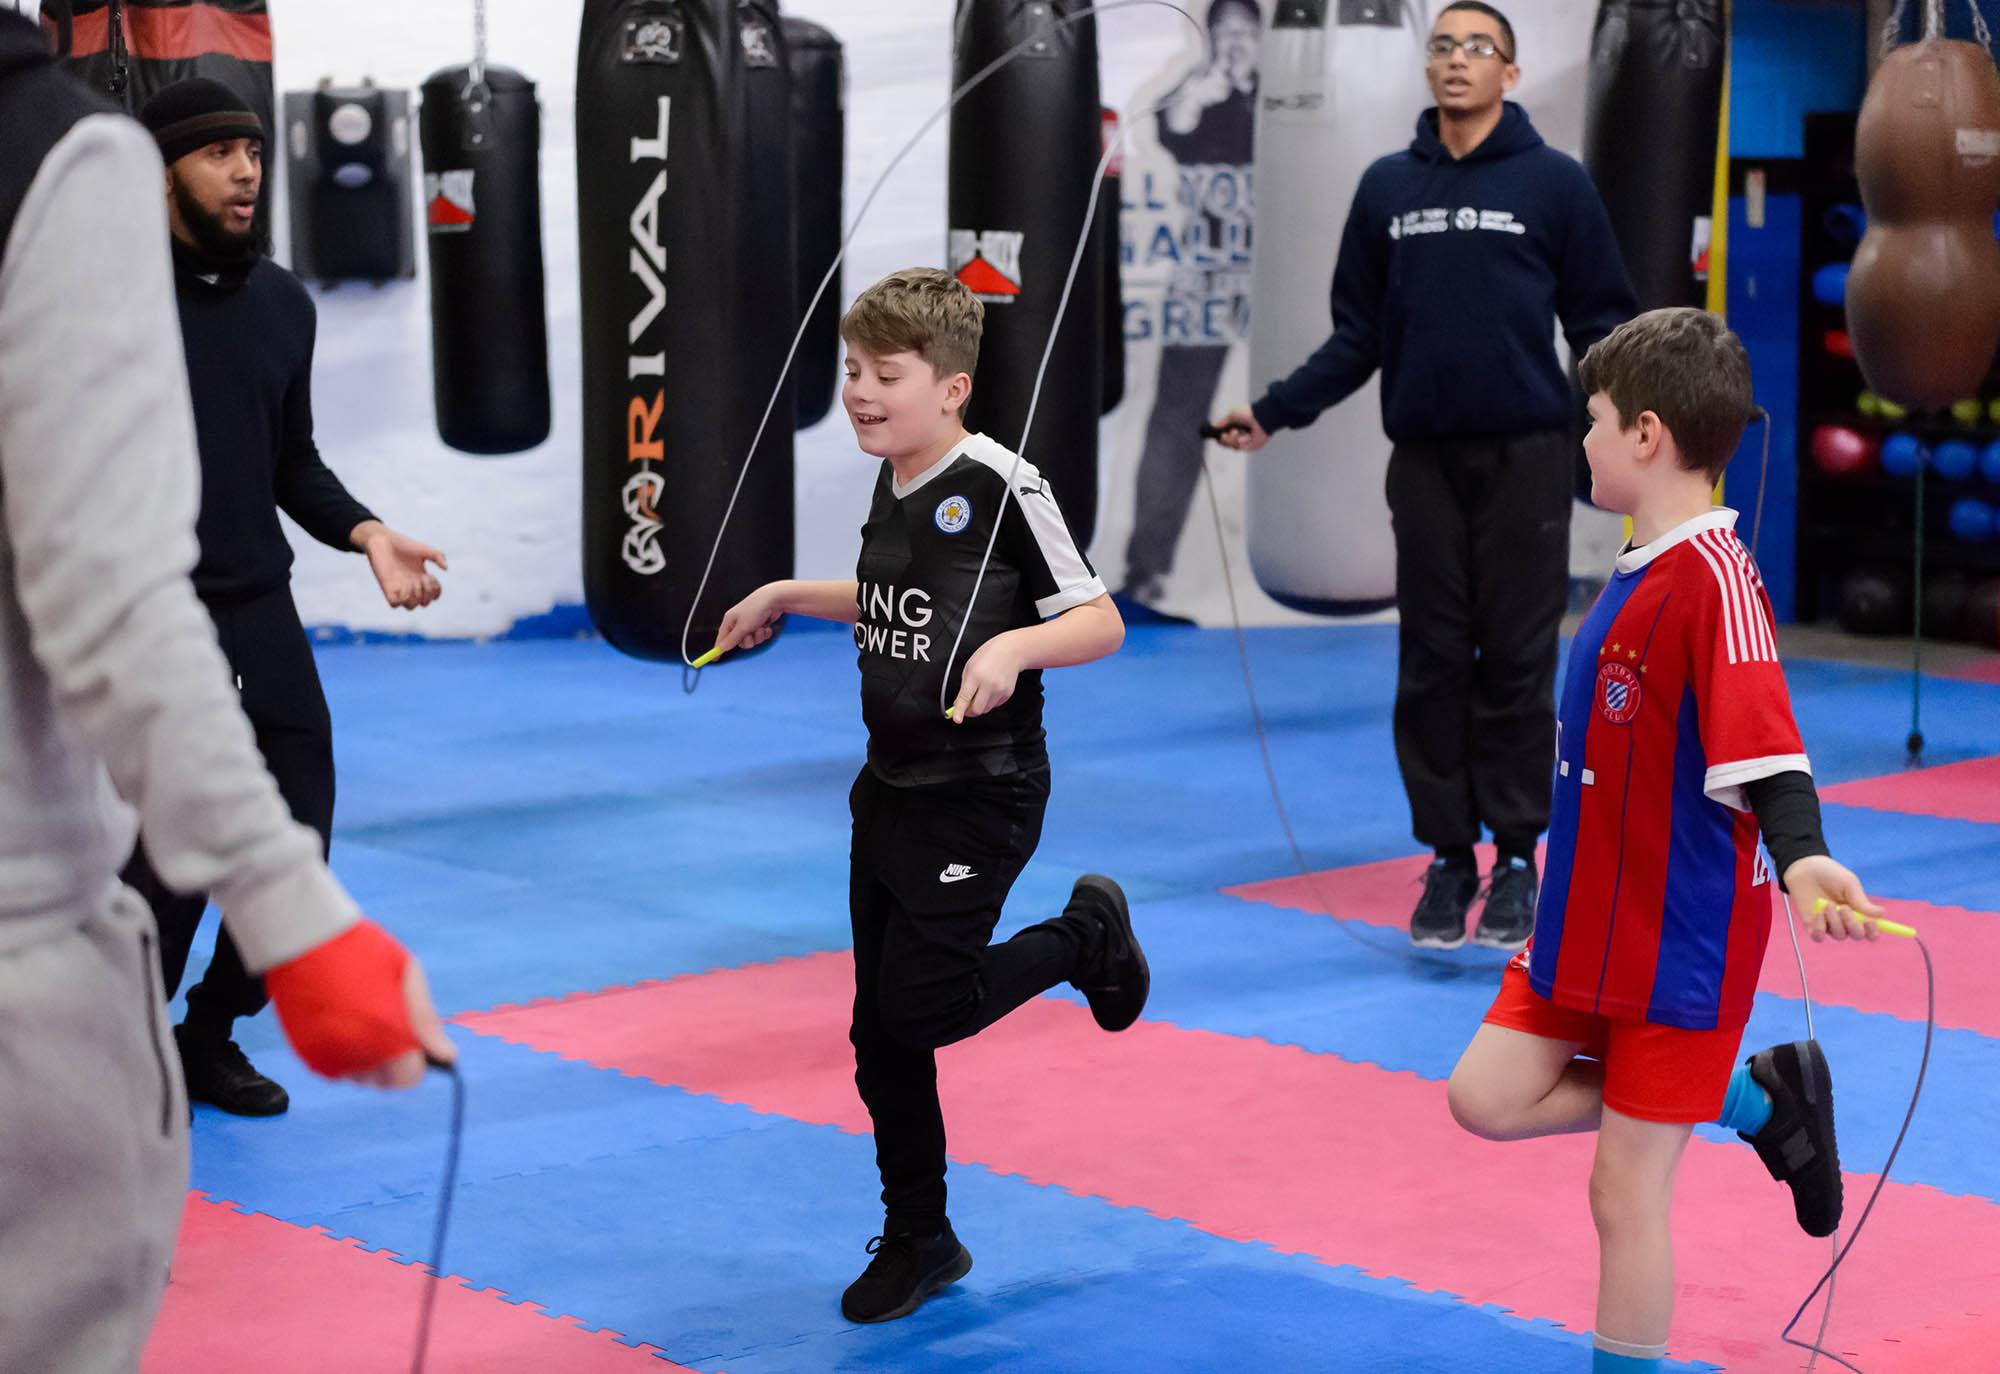 waterfront-boxing-academy-1-resized.jpg.JPG